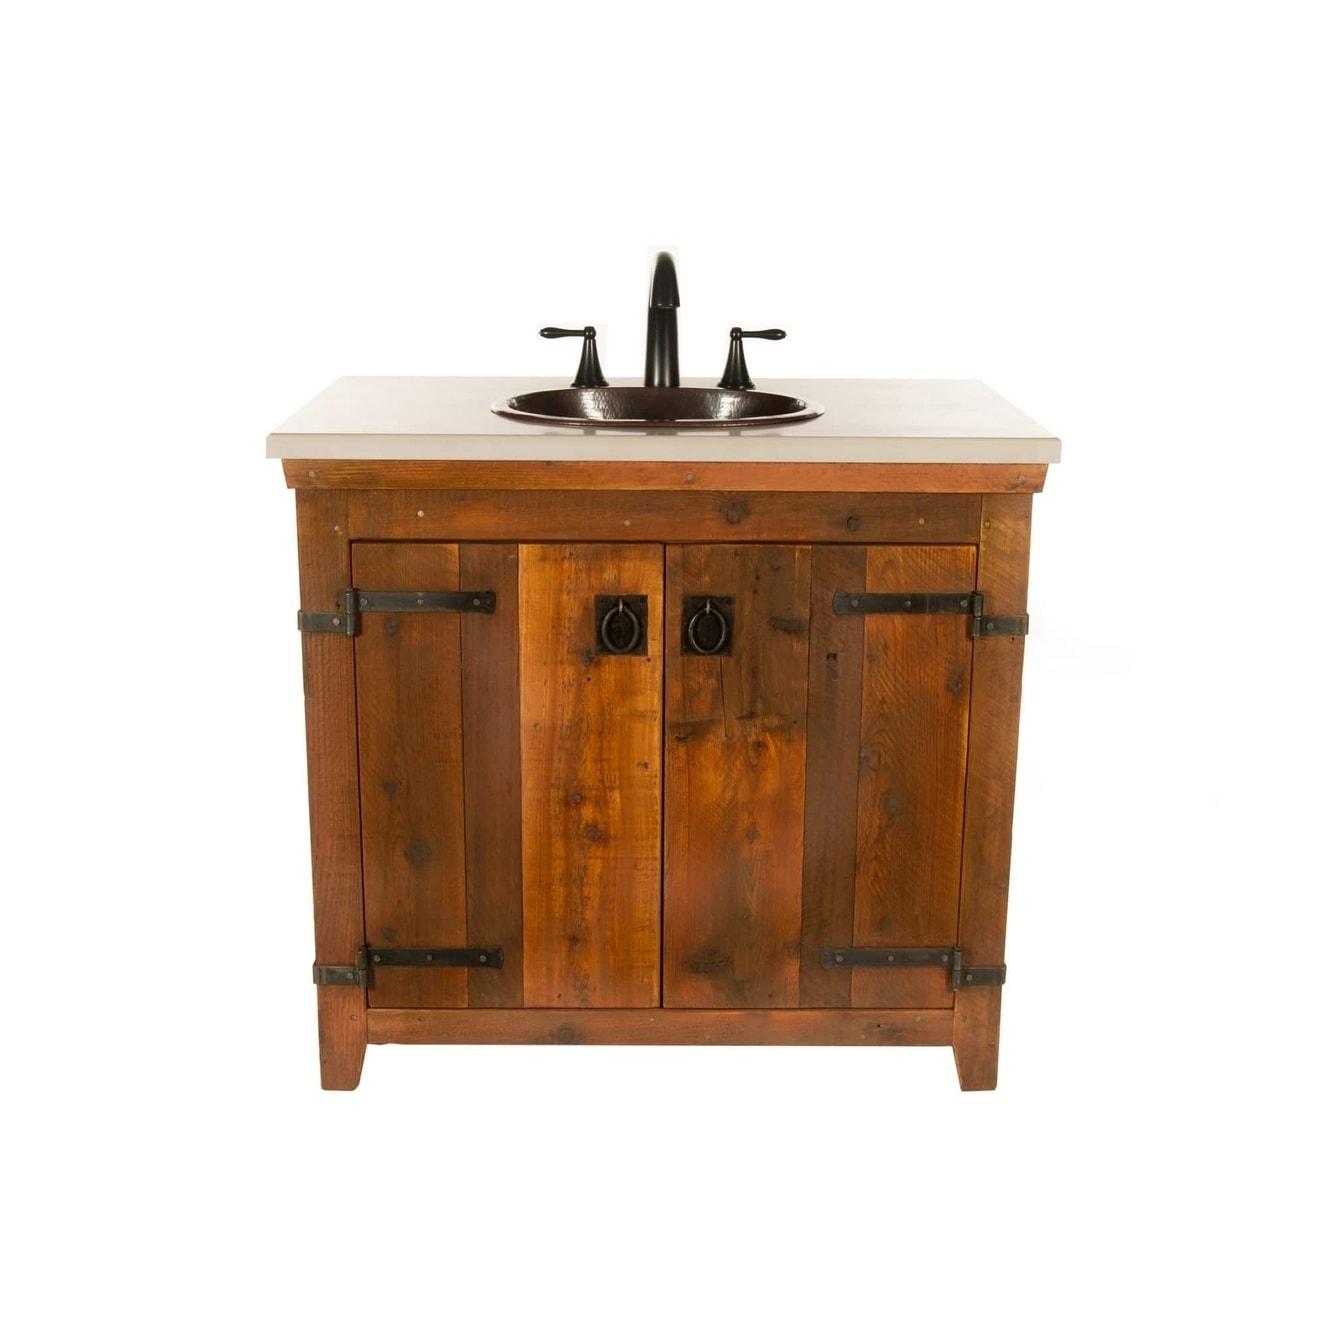 Americana Chestnut 48 Inch Reclaimed Wood Bathroom Vanity Base Only Overstock 18235407